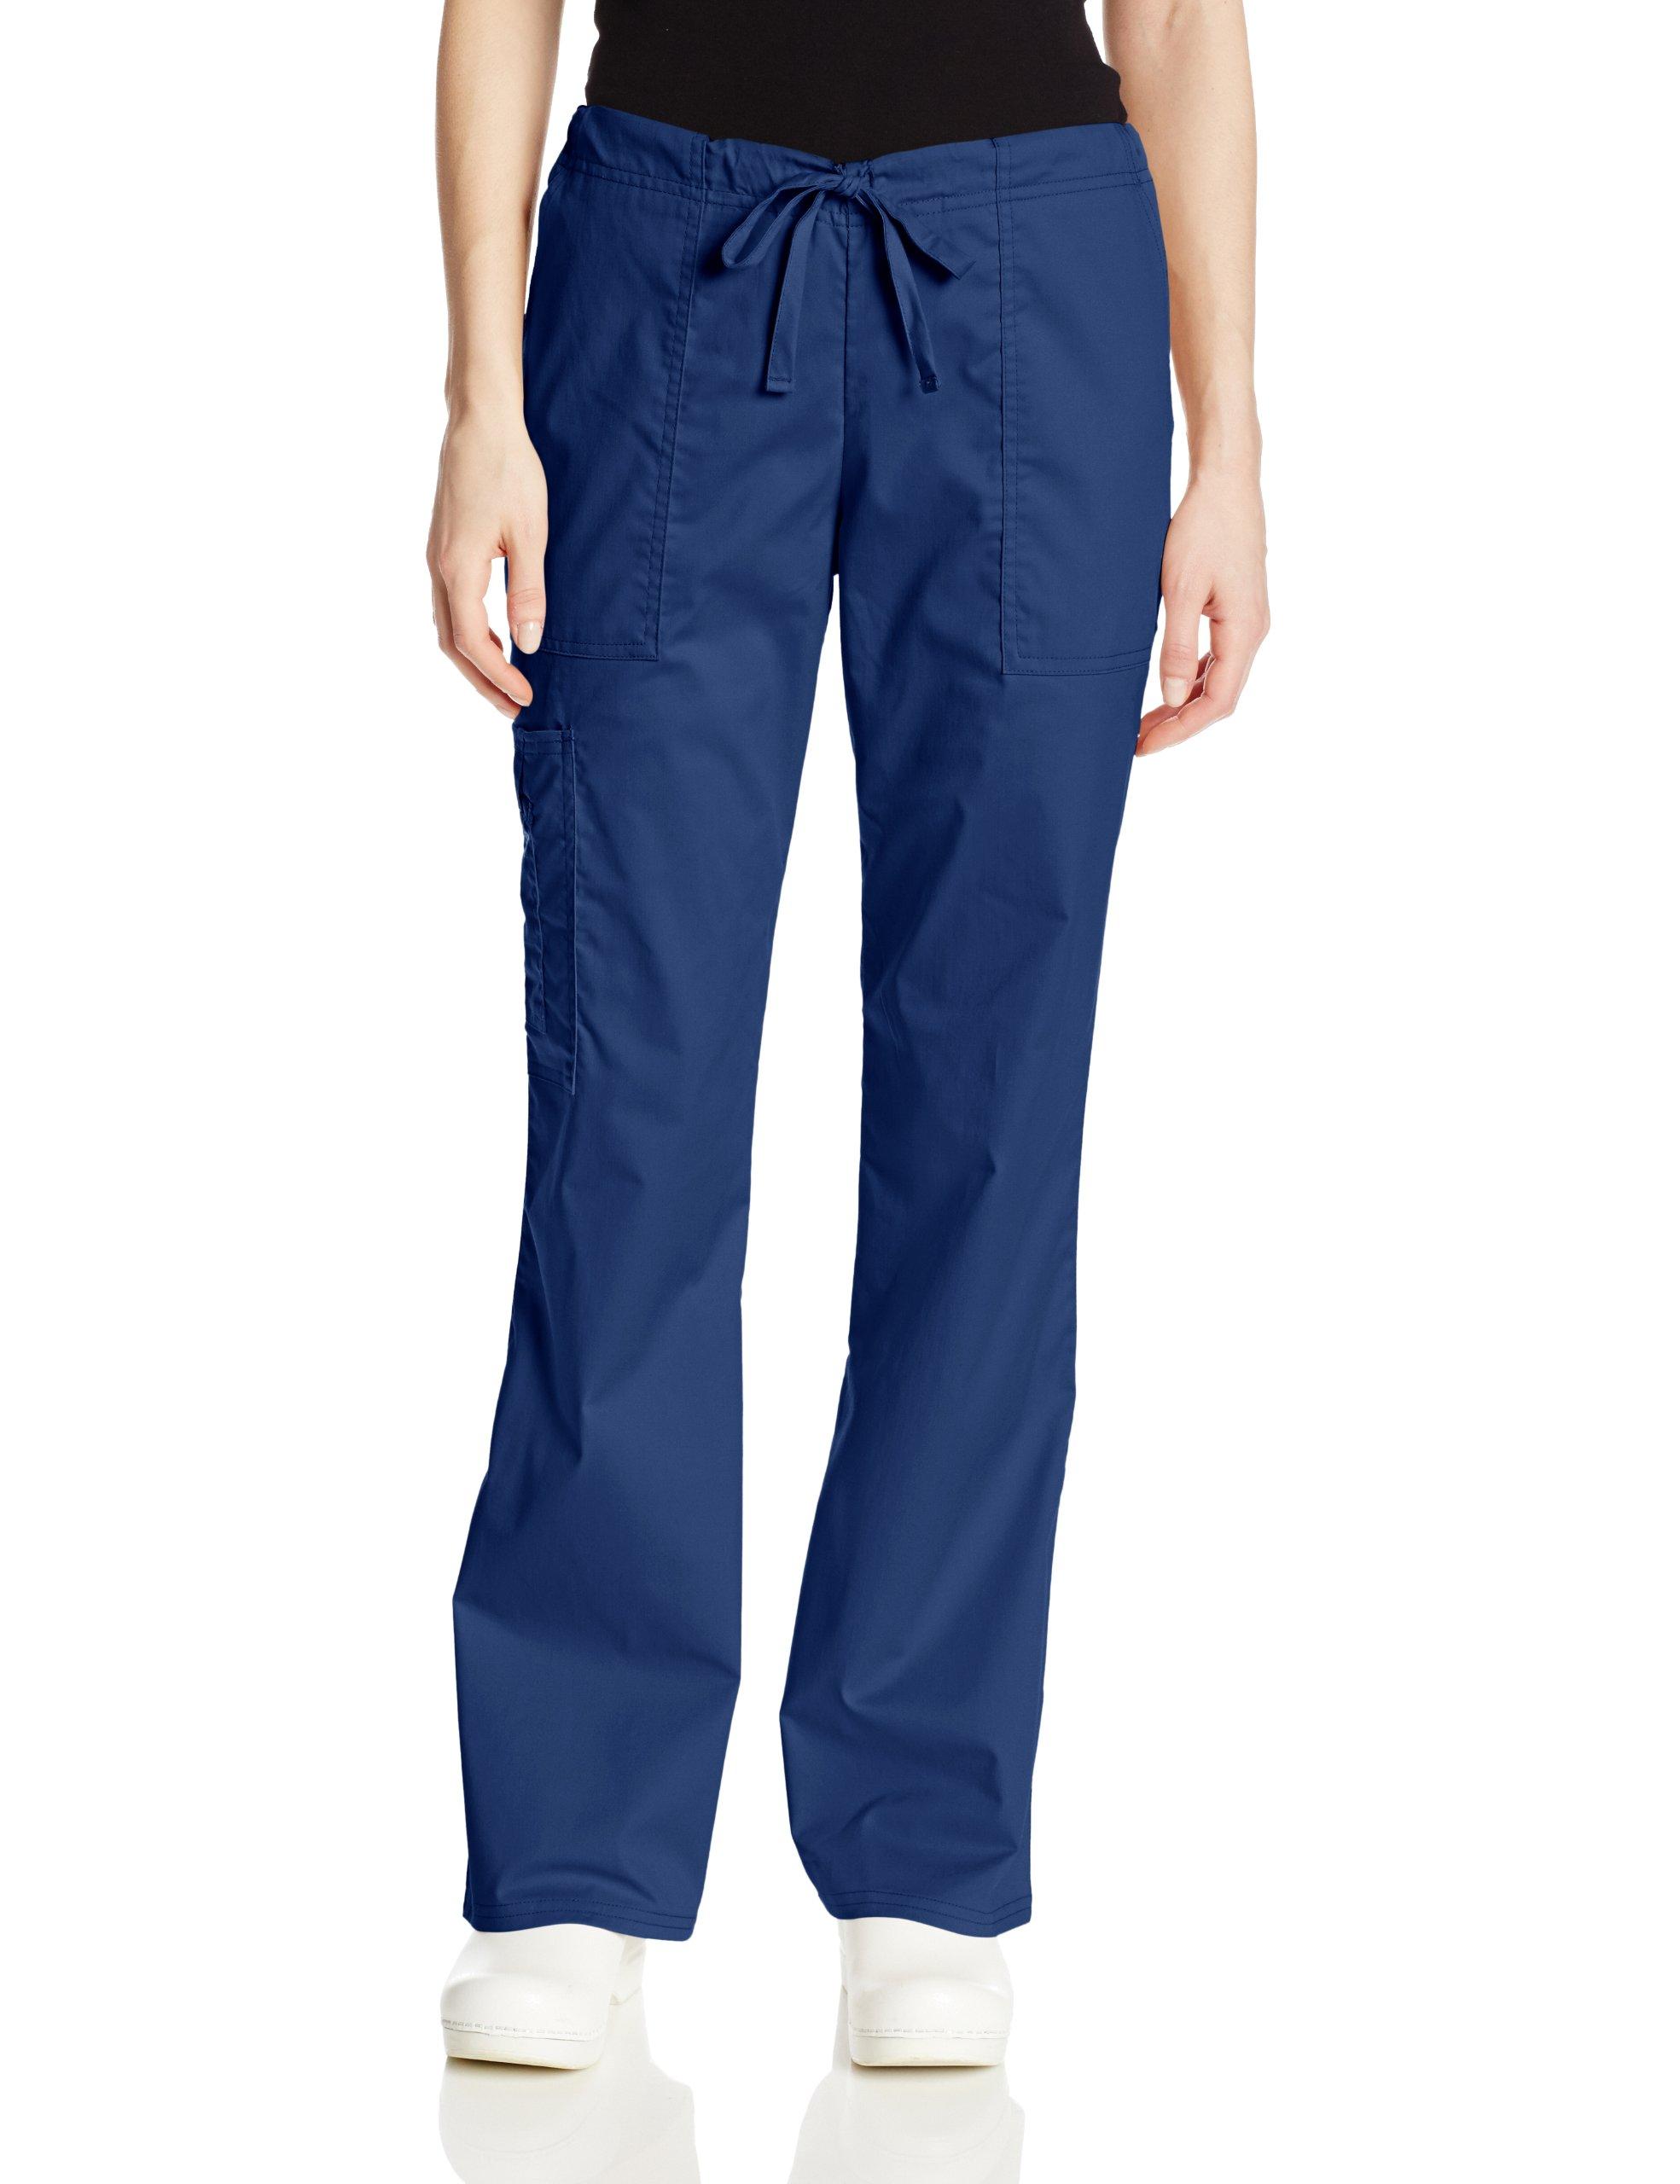 Cherokee Women's Workwear Scrubs Mid-Rise Core Stretch Drawstring Cargo Pant, Navy, X-Large